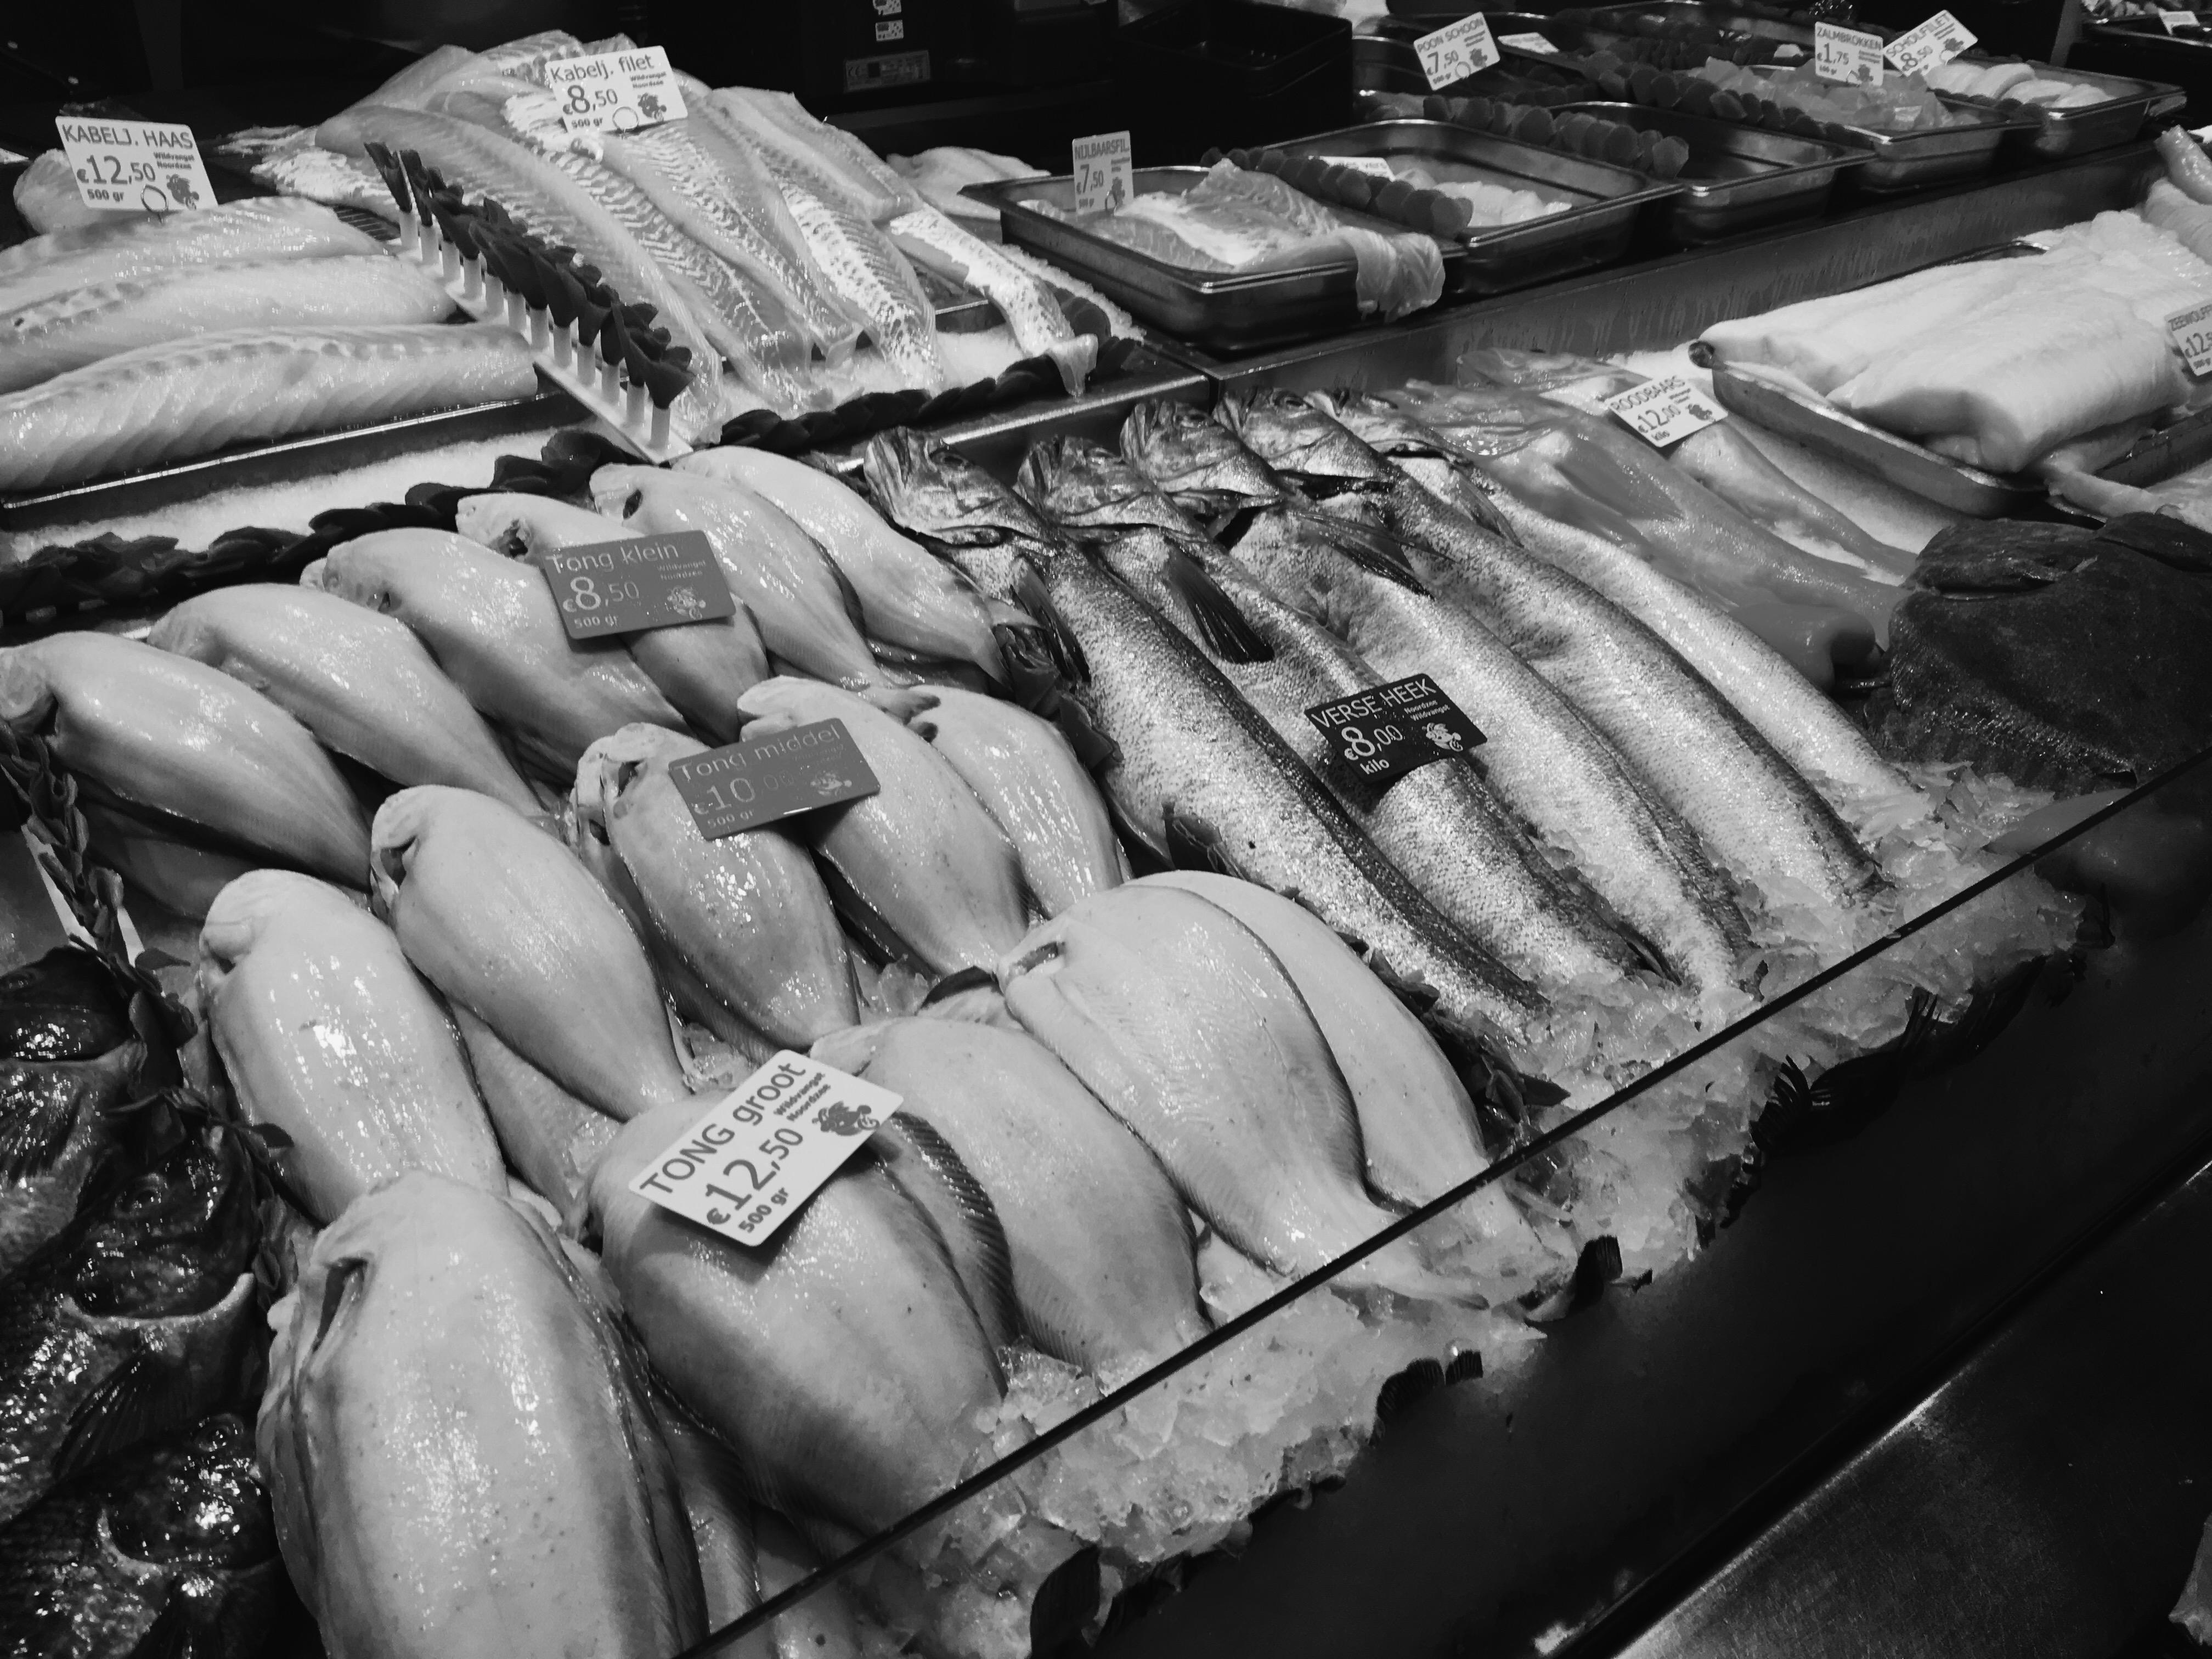 anna frost amsterdam fafine fish market